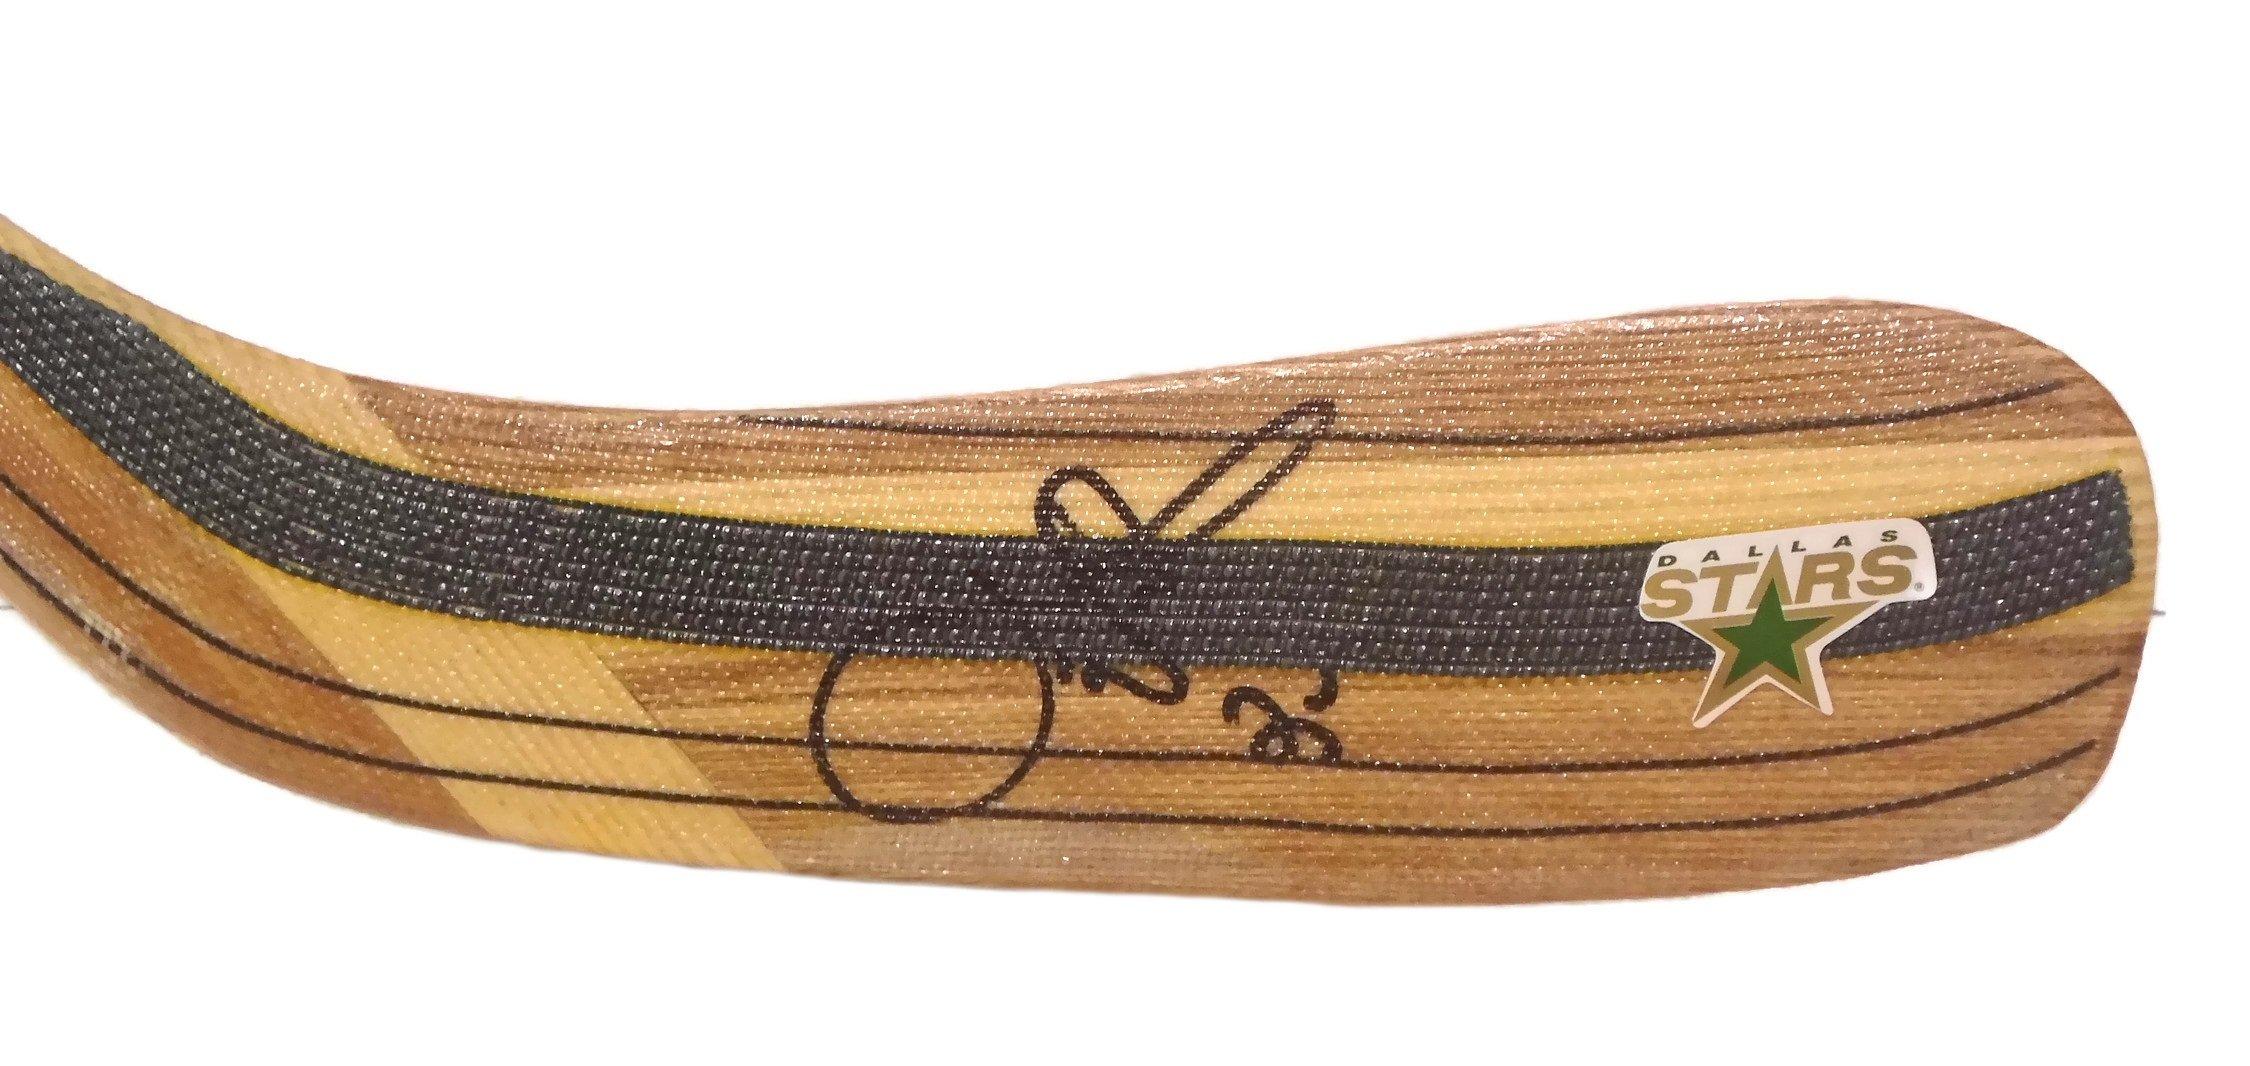 Dallas Stars Joe Nieuwendyk Autographed Hand Signed Stars Logo Hockey Stick Blade with Proof Photo of Signing and COA